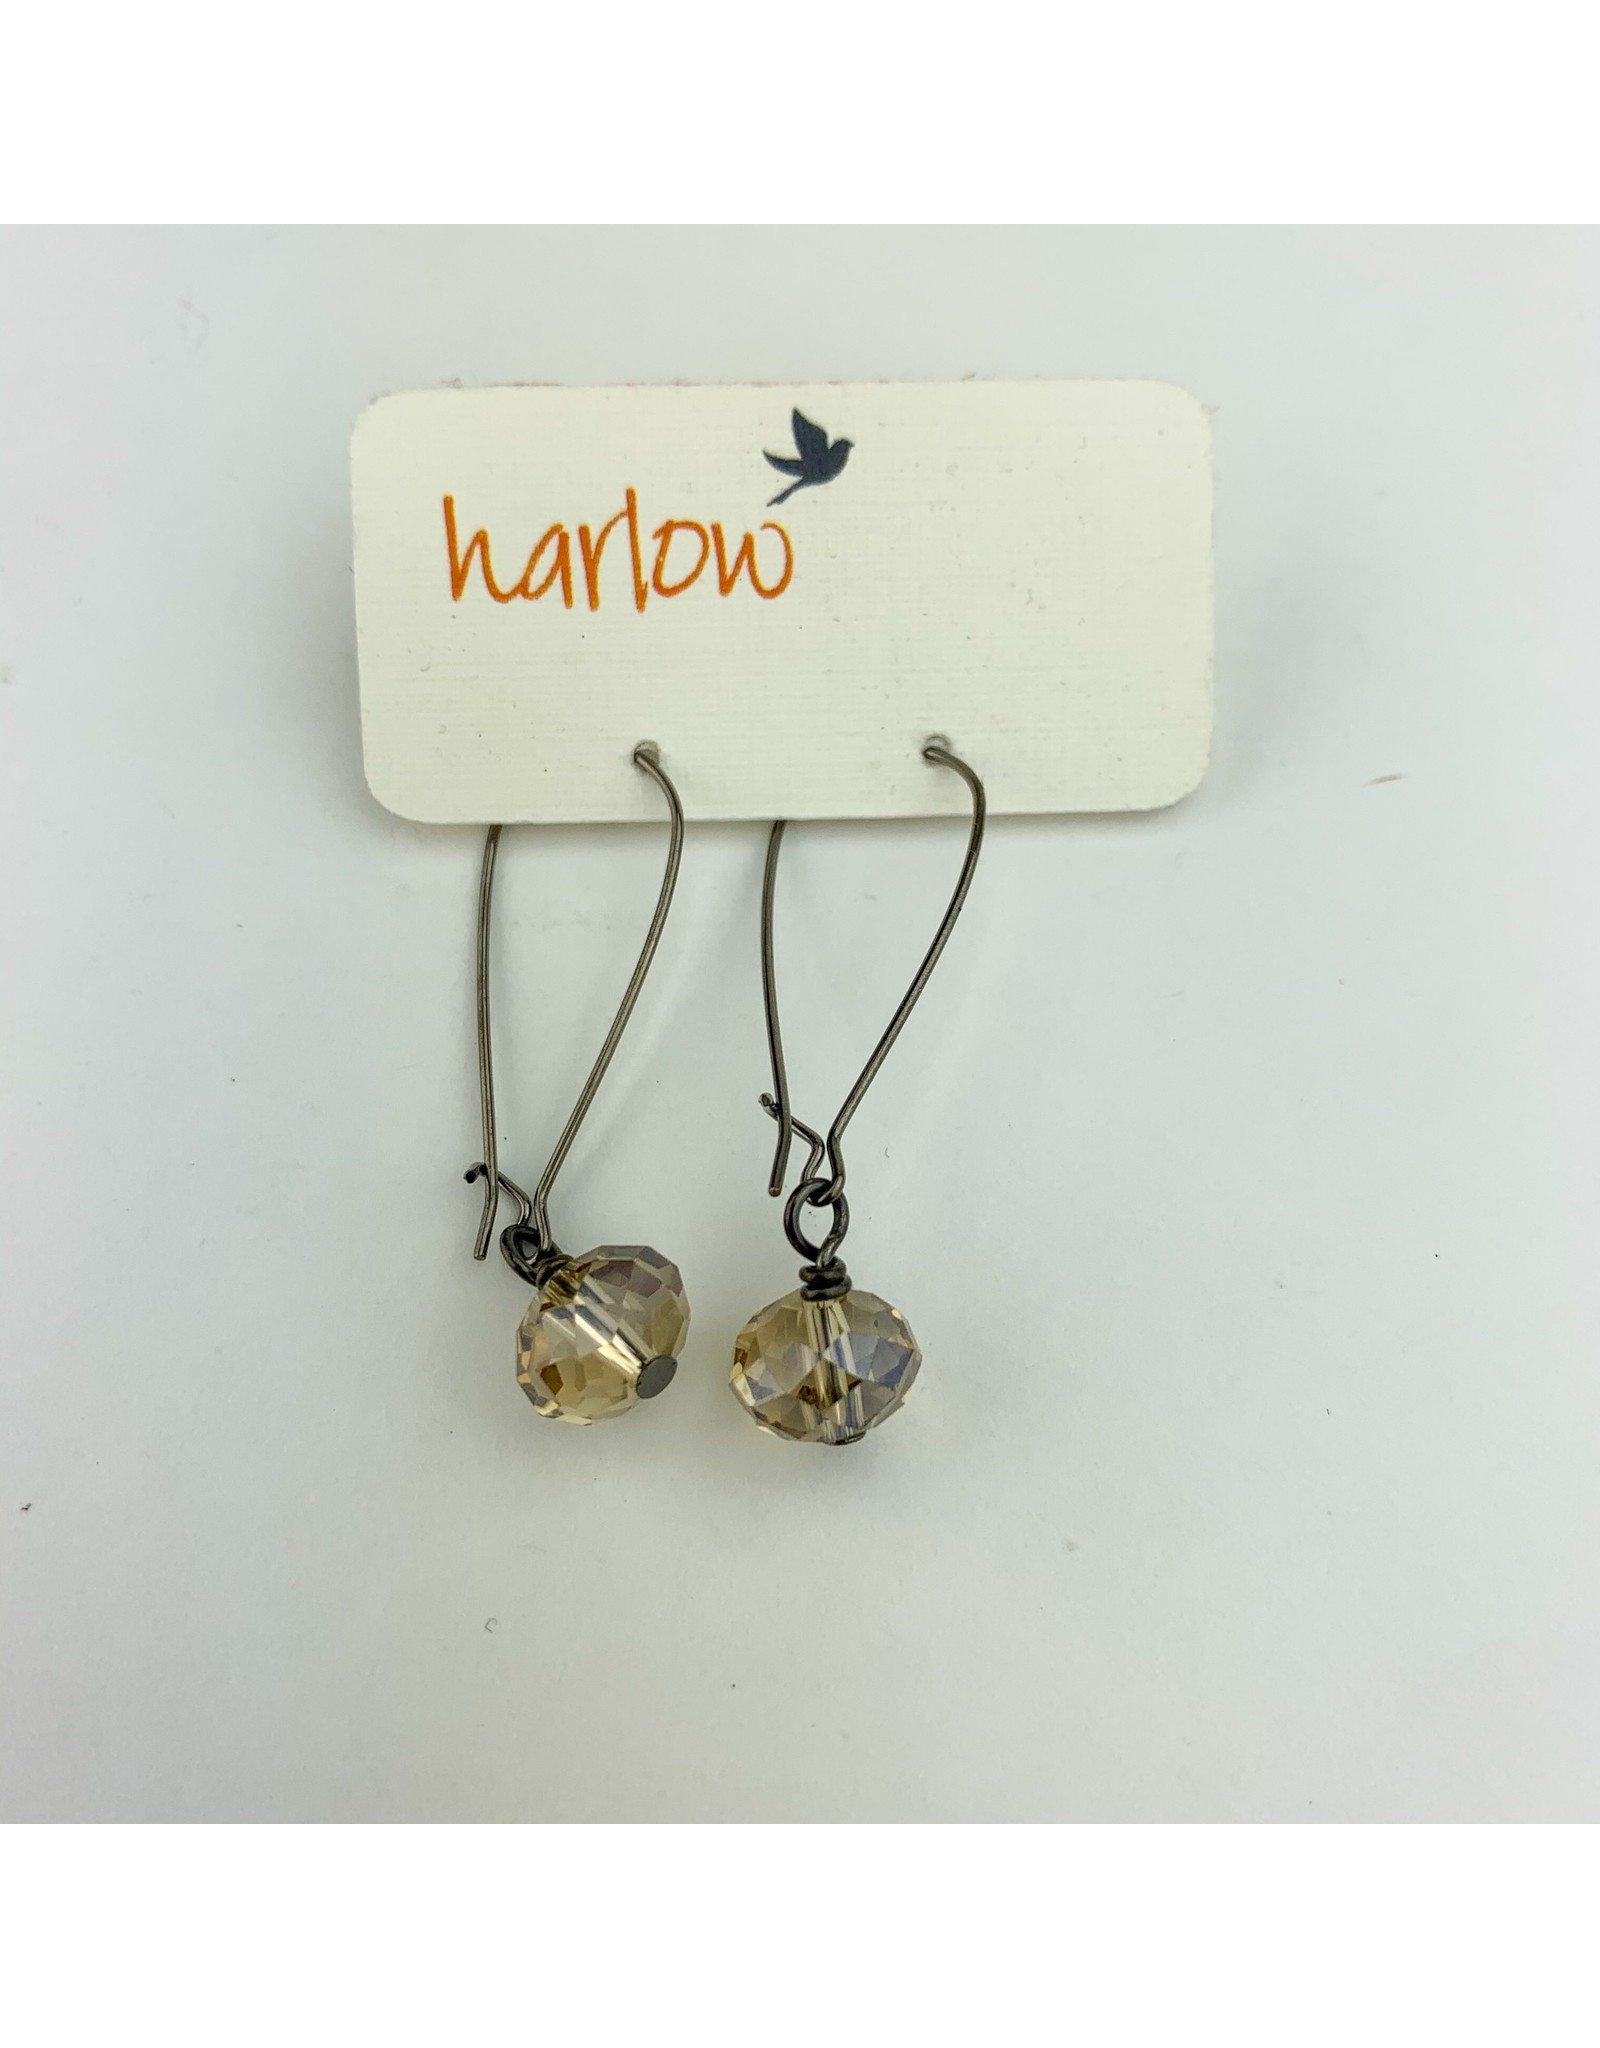 Harlow Champagne Crystal earrings